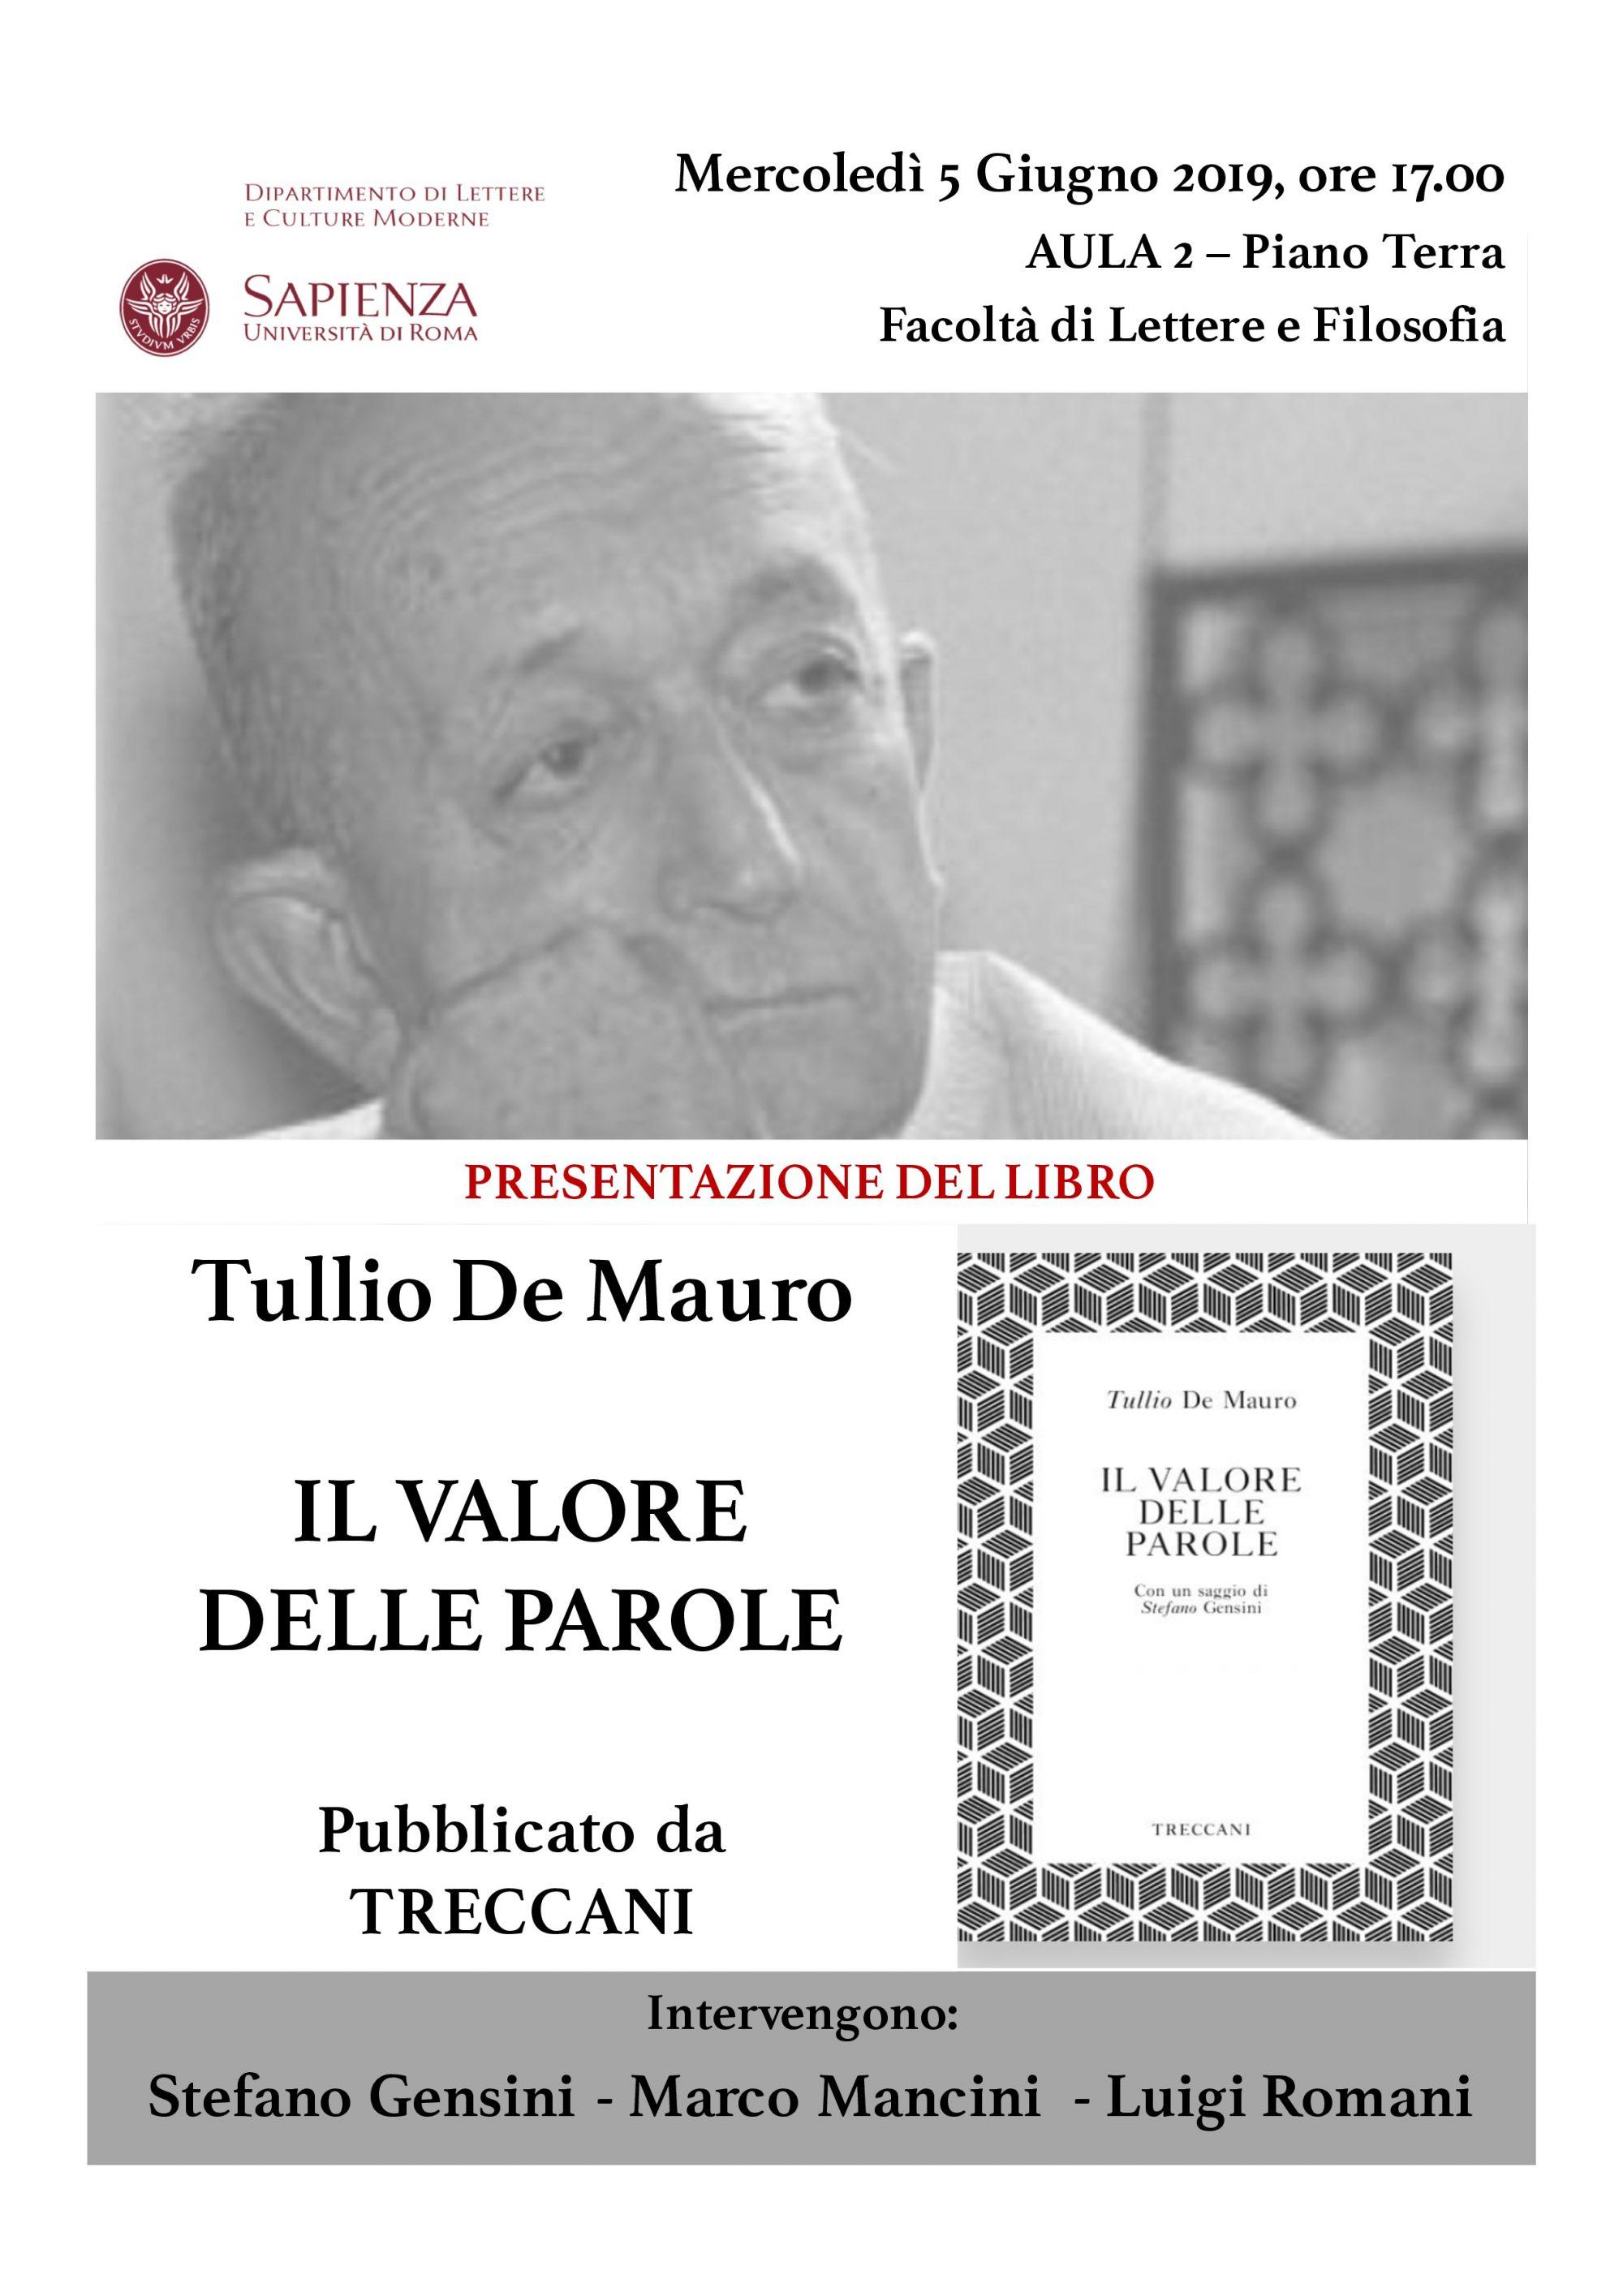 Calendario Accademico Sapienza 2020 2020.News Tullio De Mauro